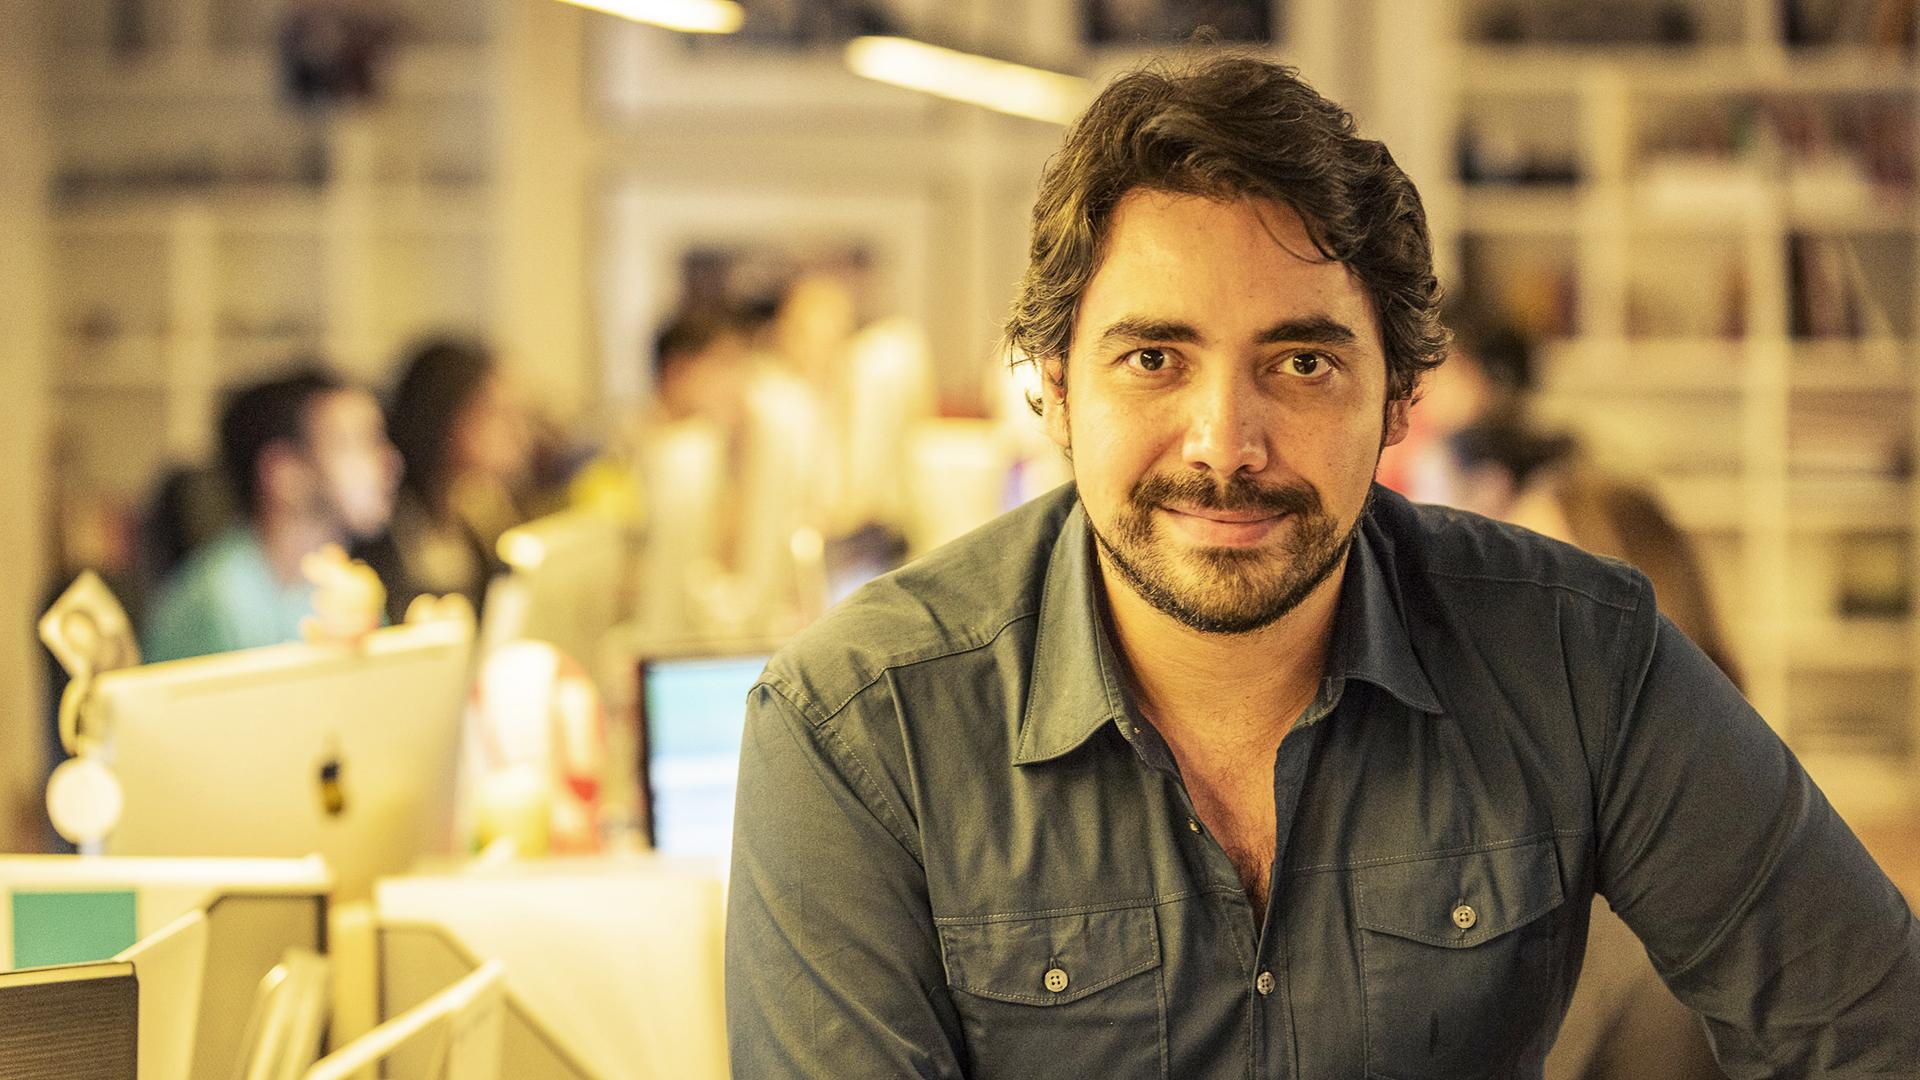 Carlos Grillo – CEO da Fermento e pai do Lucas